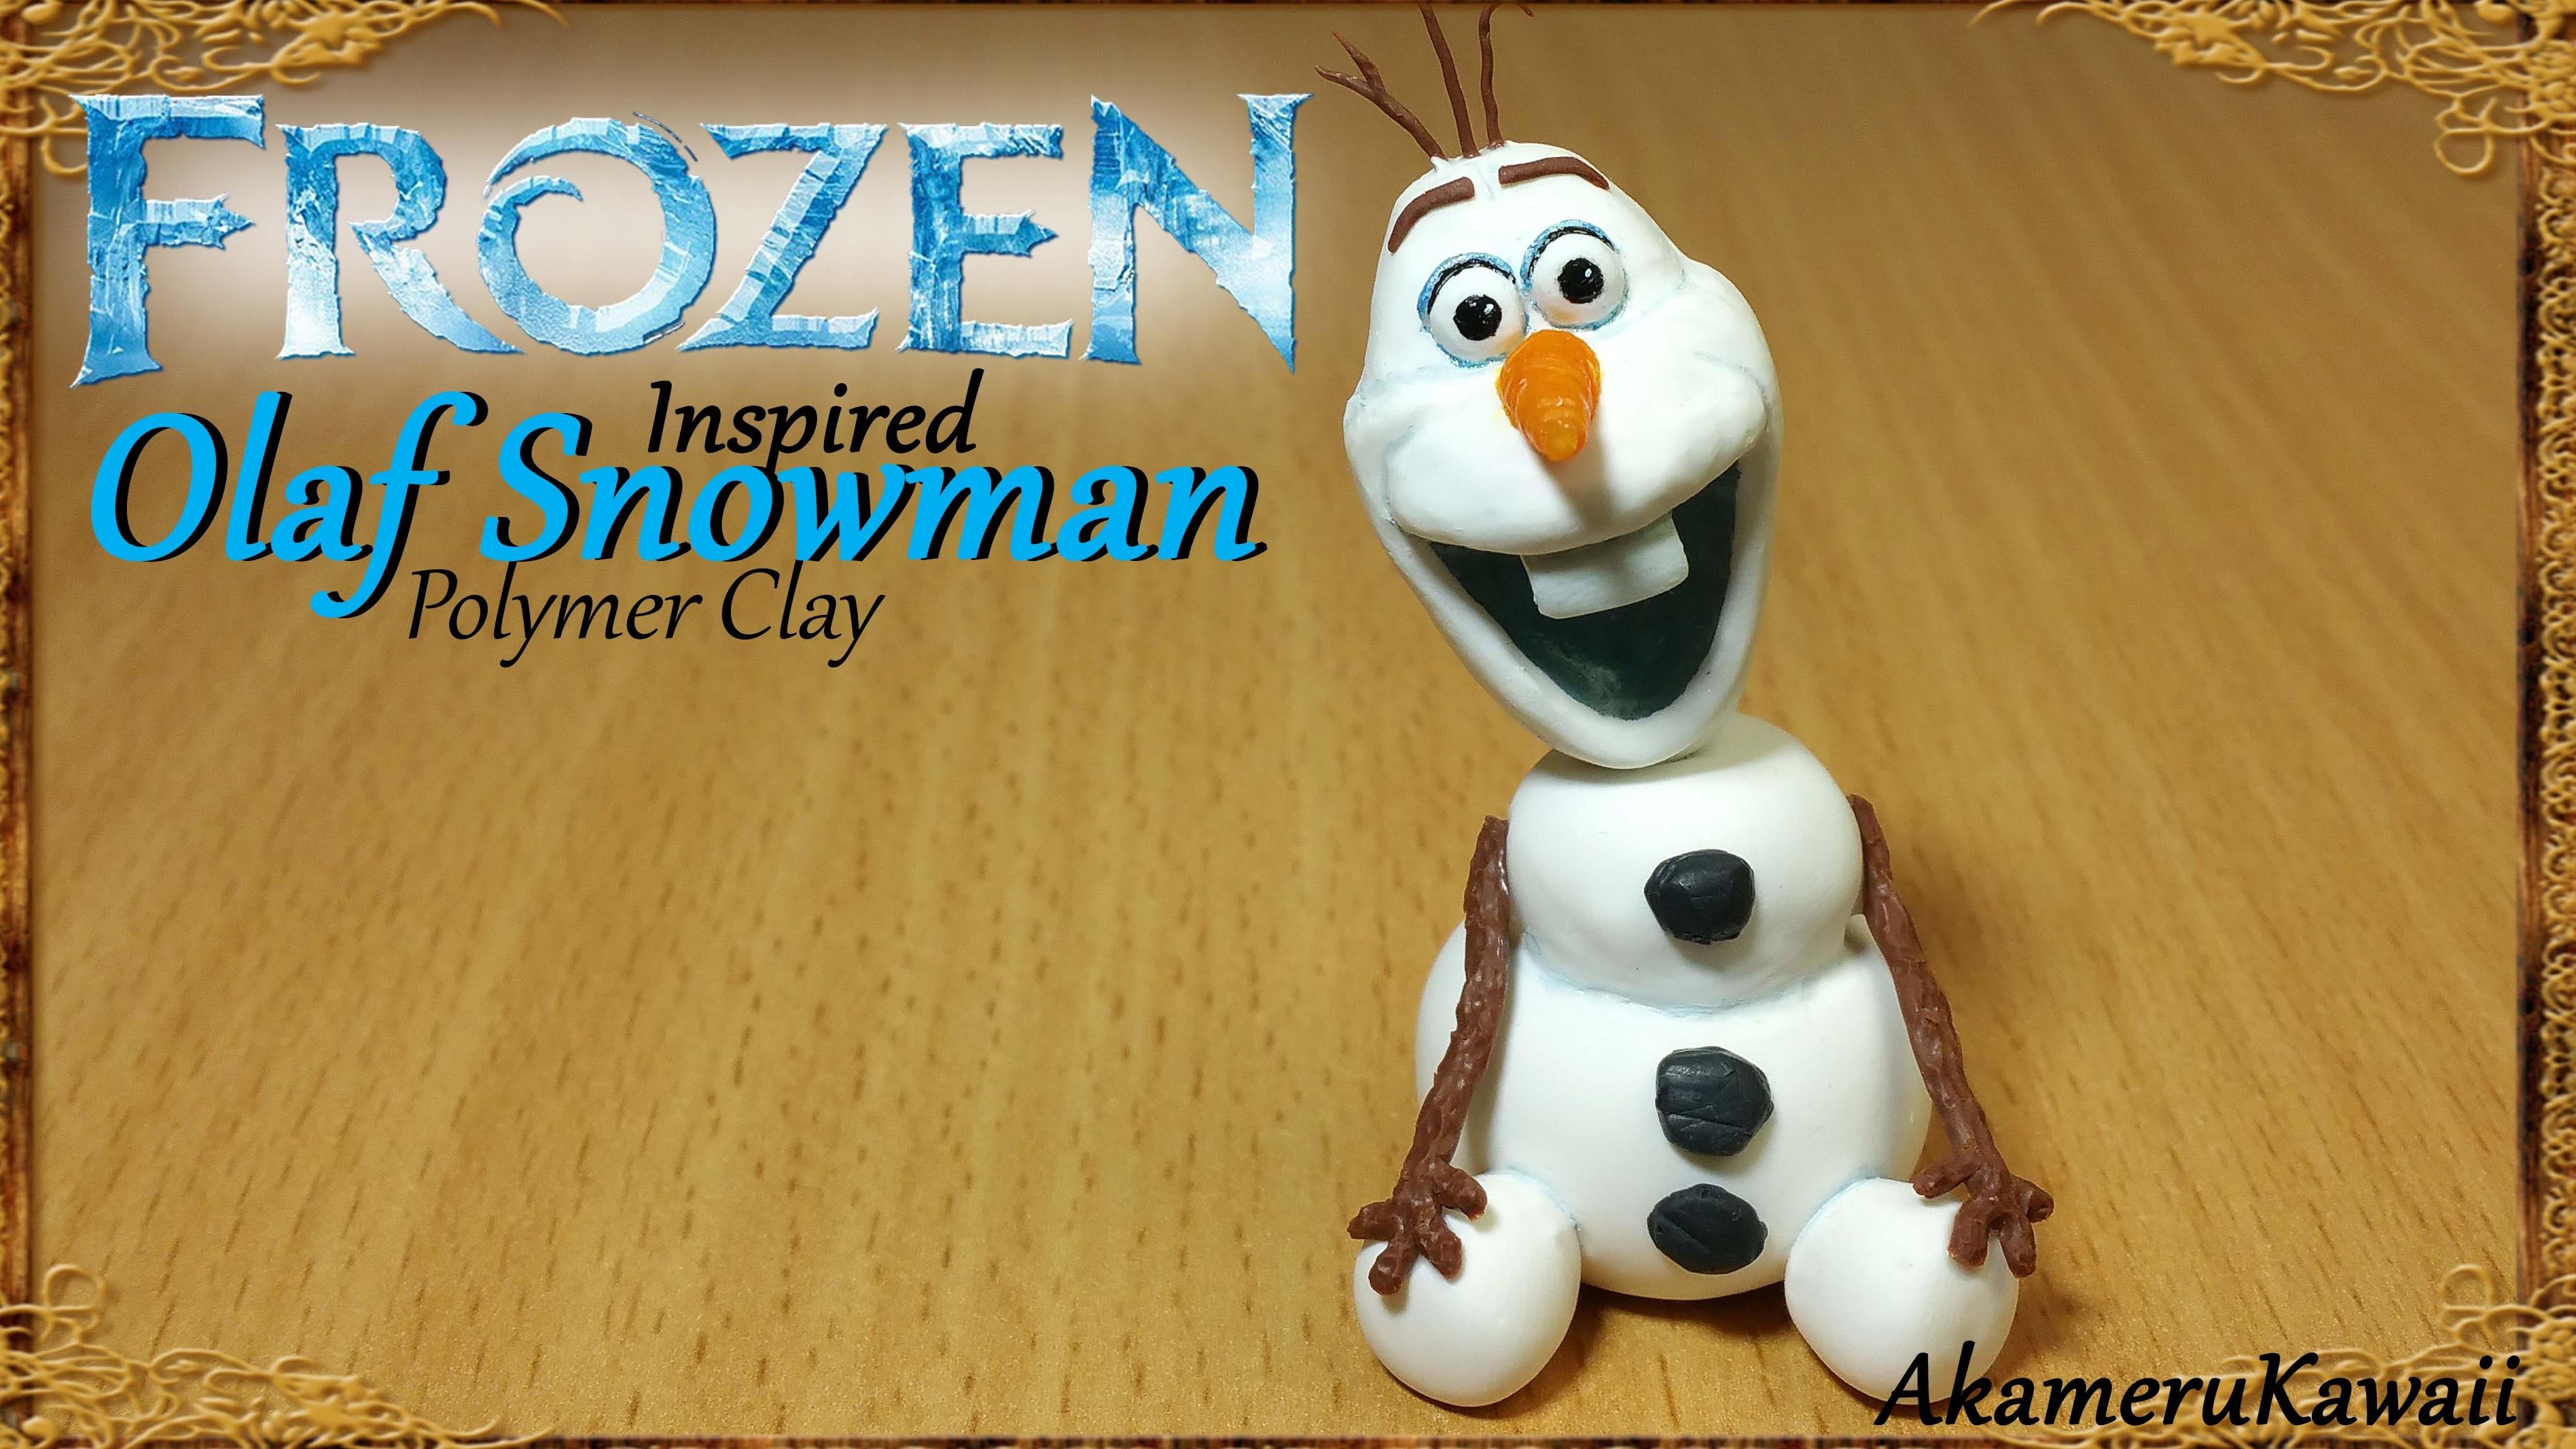 Olaf Snowman; Disney's Frozen inspired - Polymer Clay Tutorial